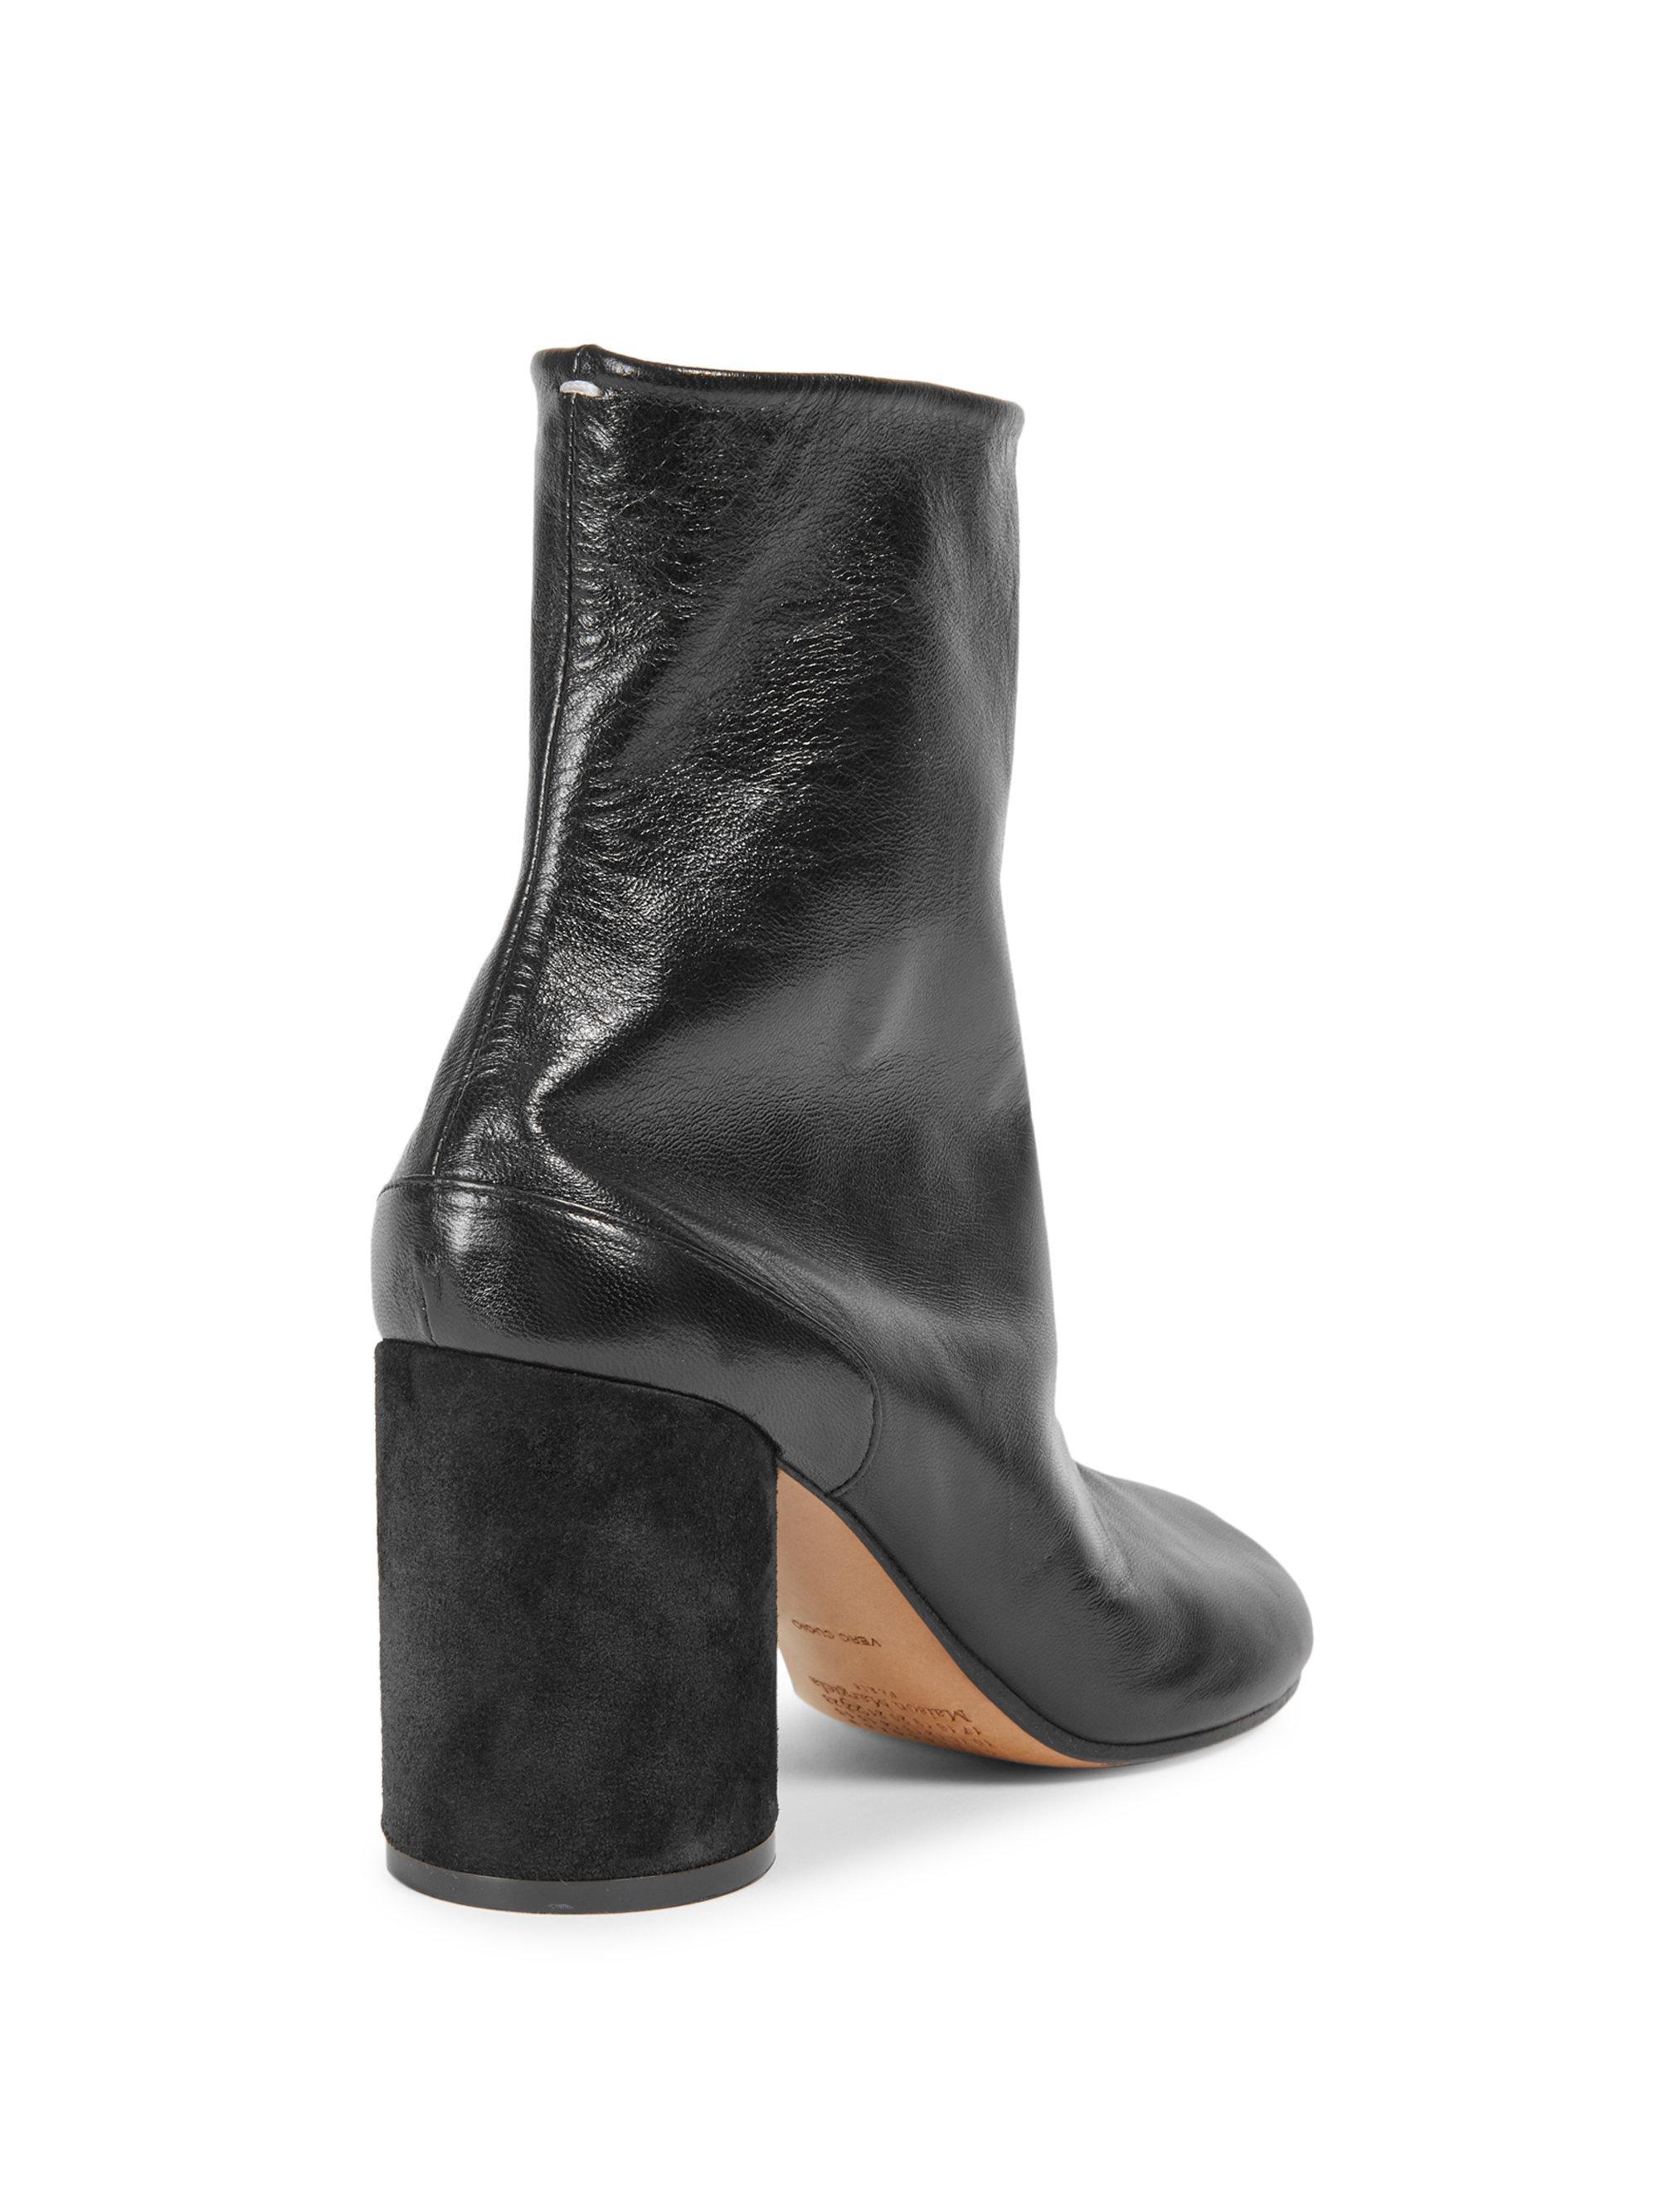 Maison Margiela - Black Leather Fold Over Mid Calf Boots - Lyst. View  fullscreen